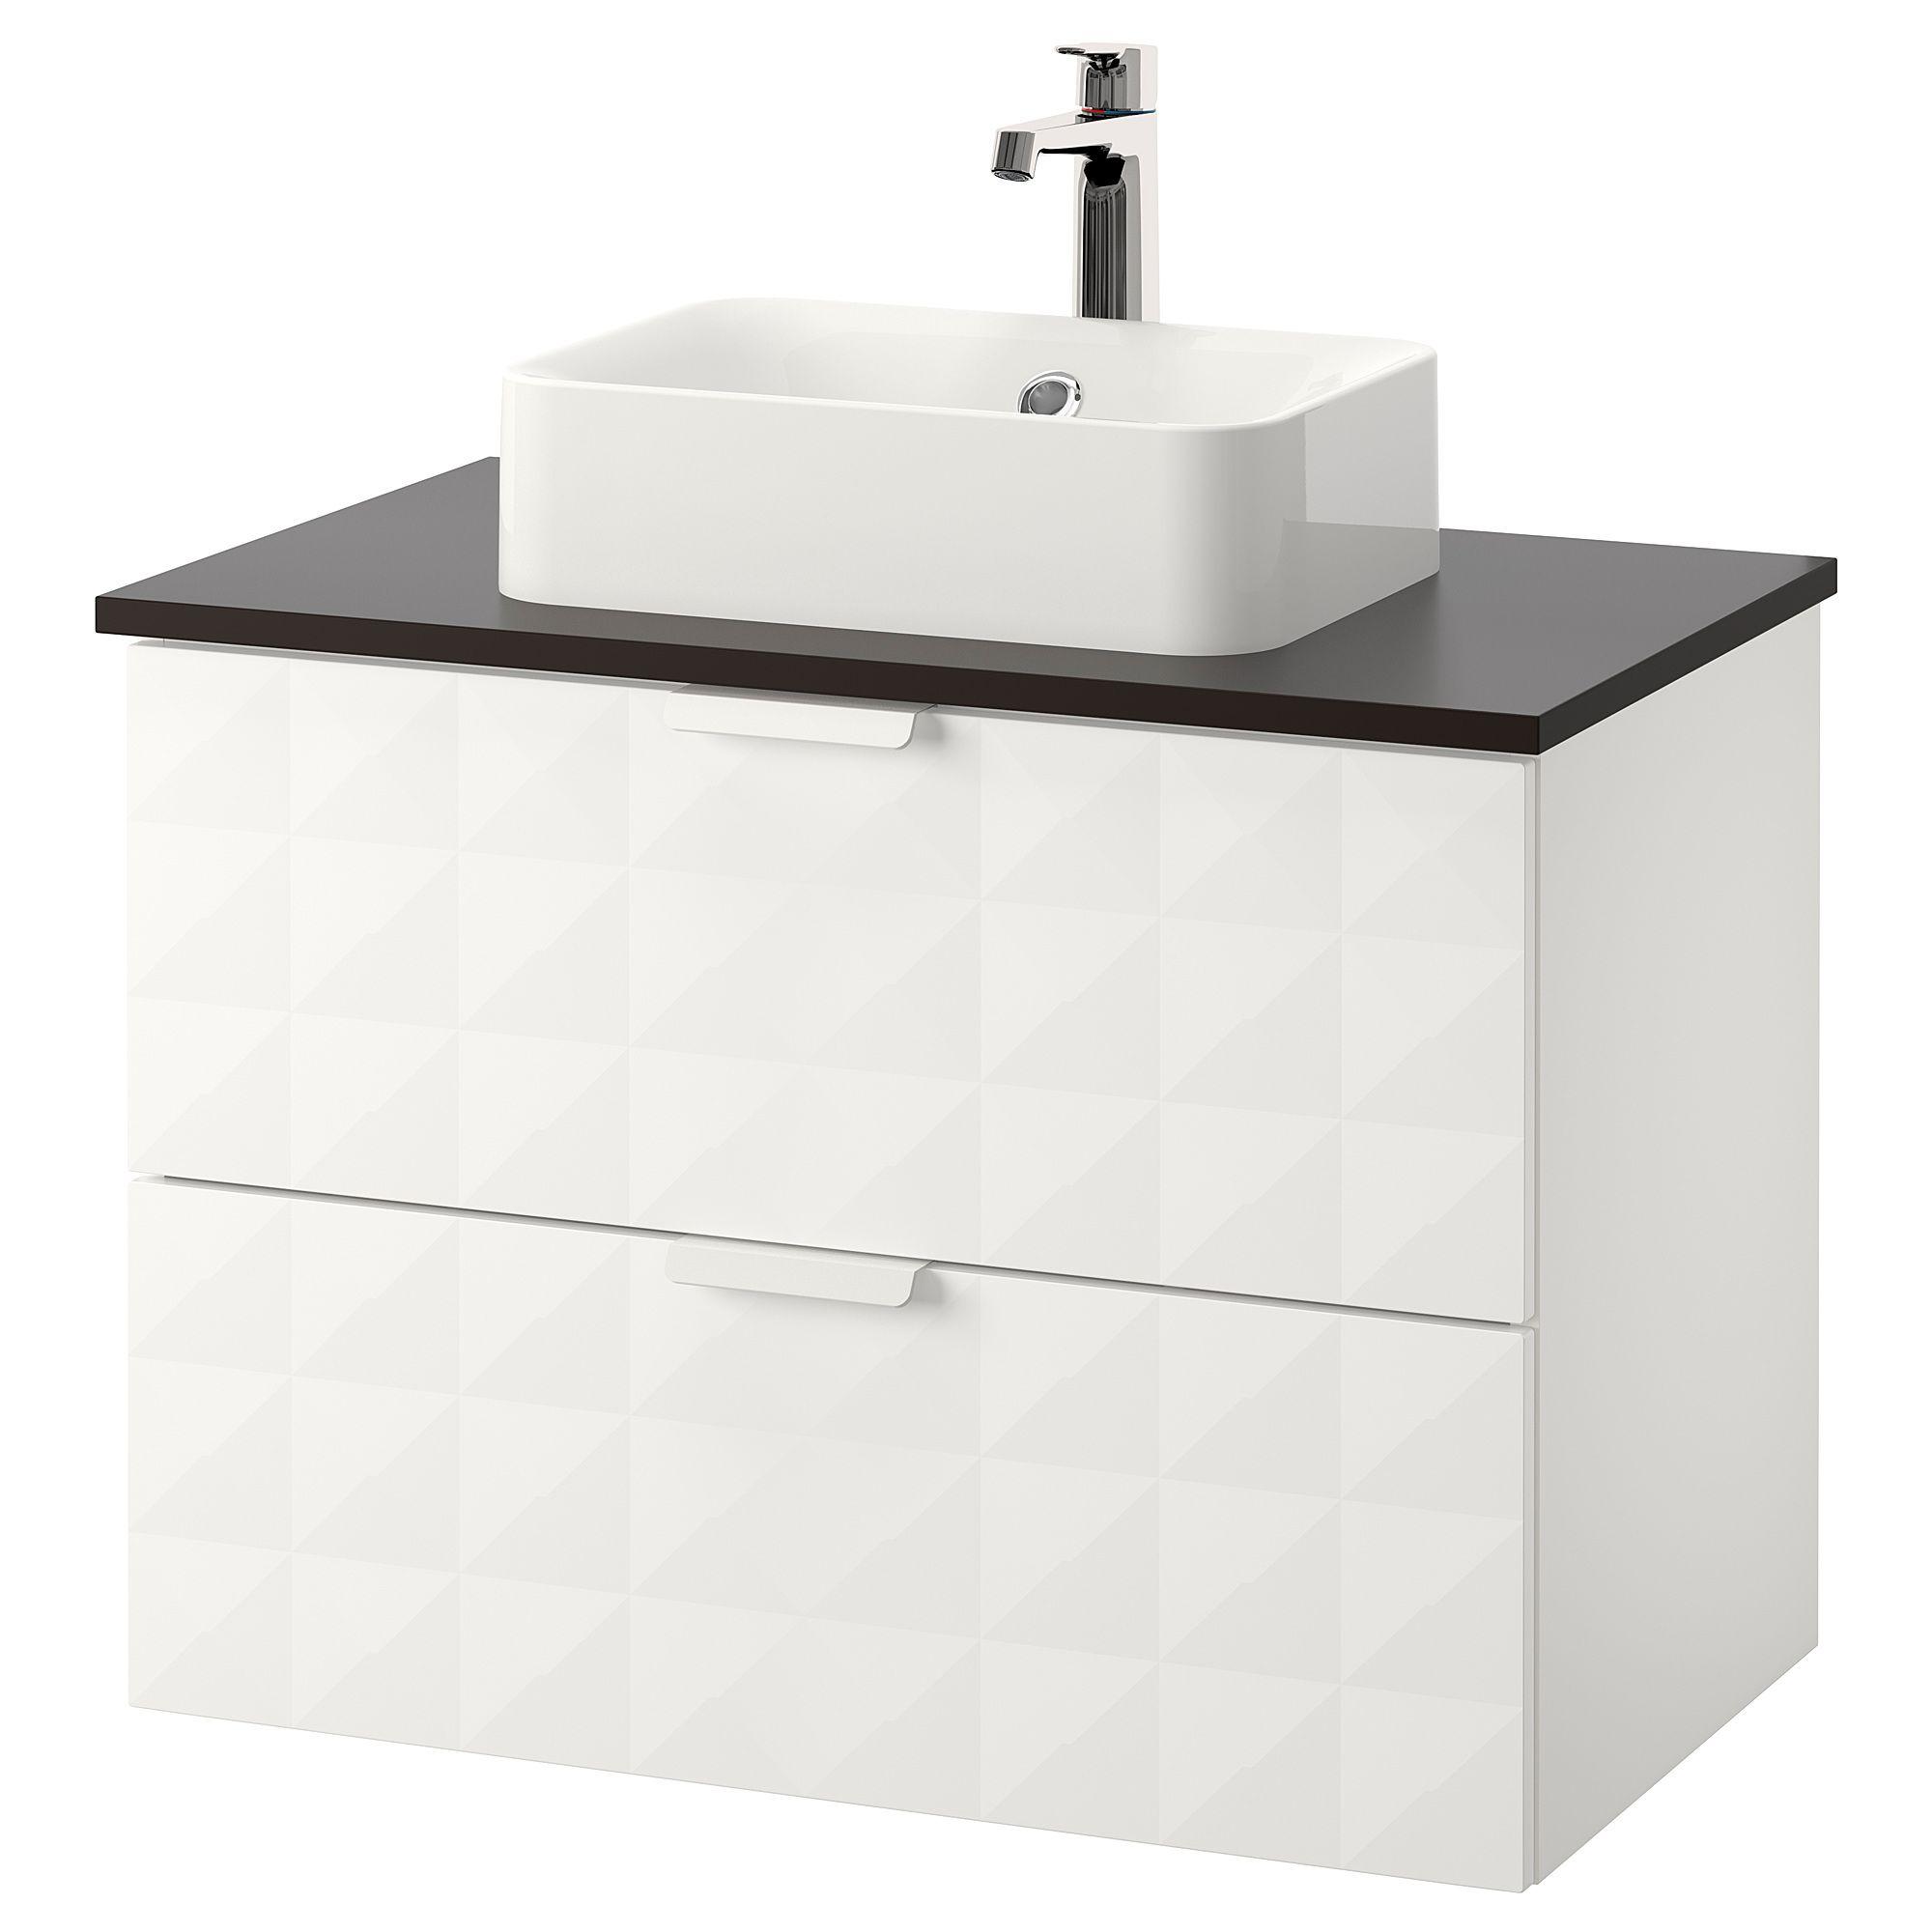 Furniture Home Furnishings Find Your Inspiration Ikea Godmorgon Washbasin Design Ikea